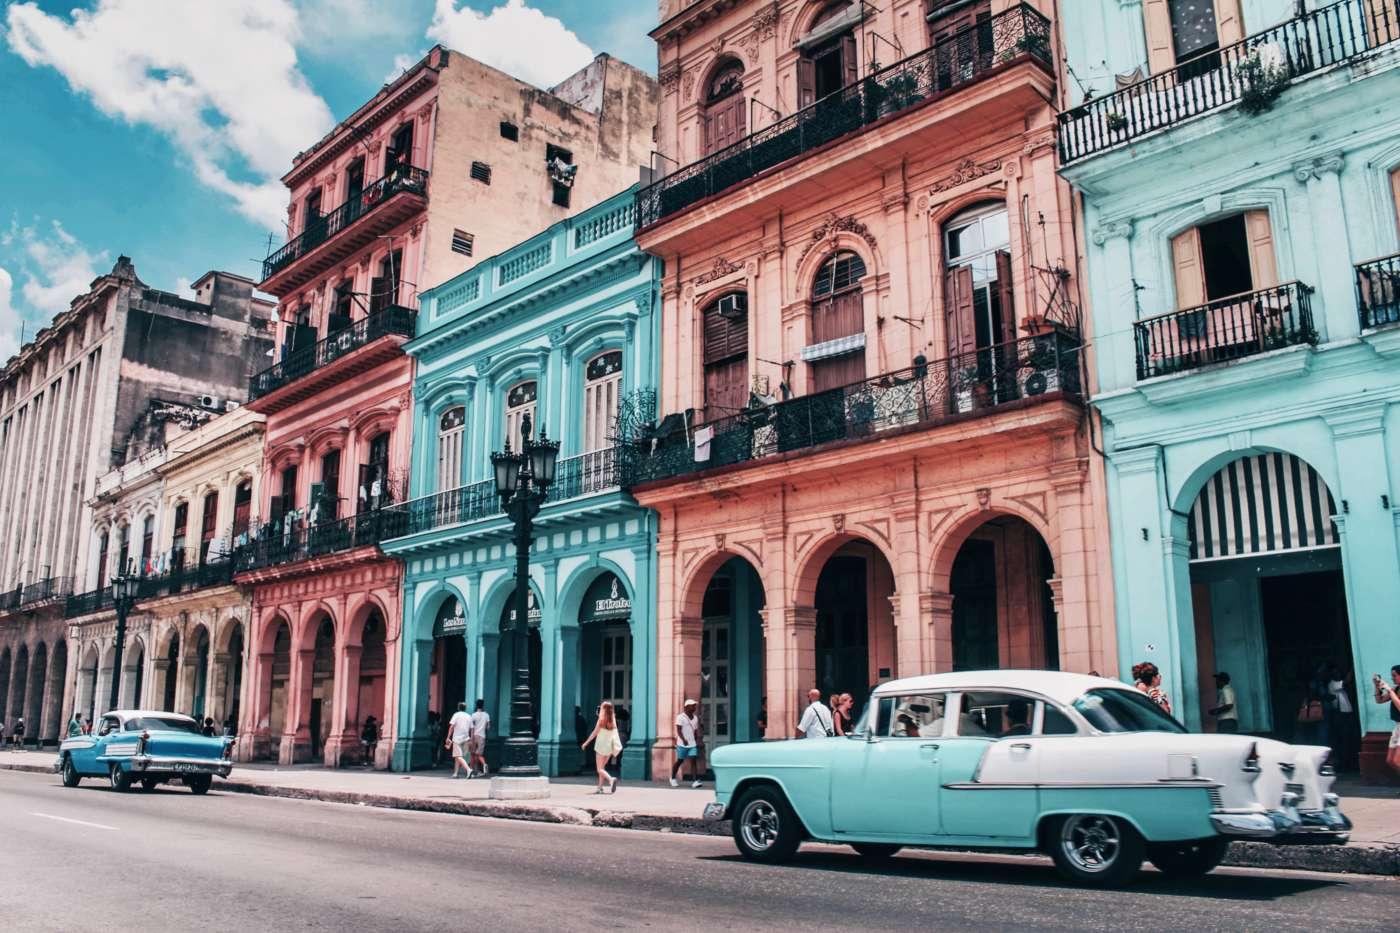 havana-cuba-visa-free-for-jamaicans